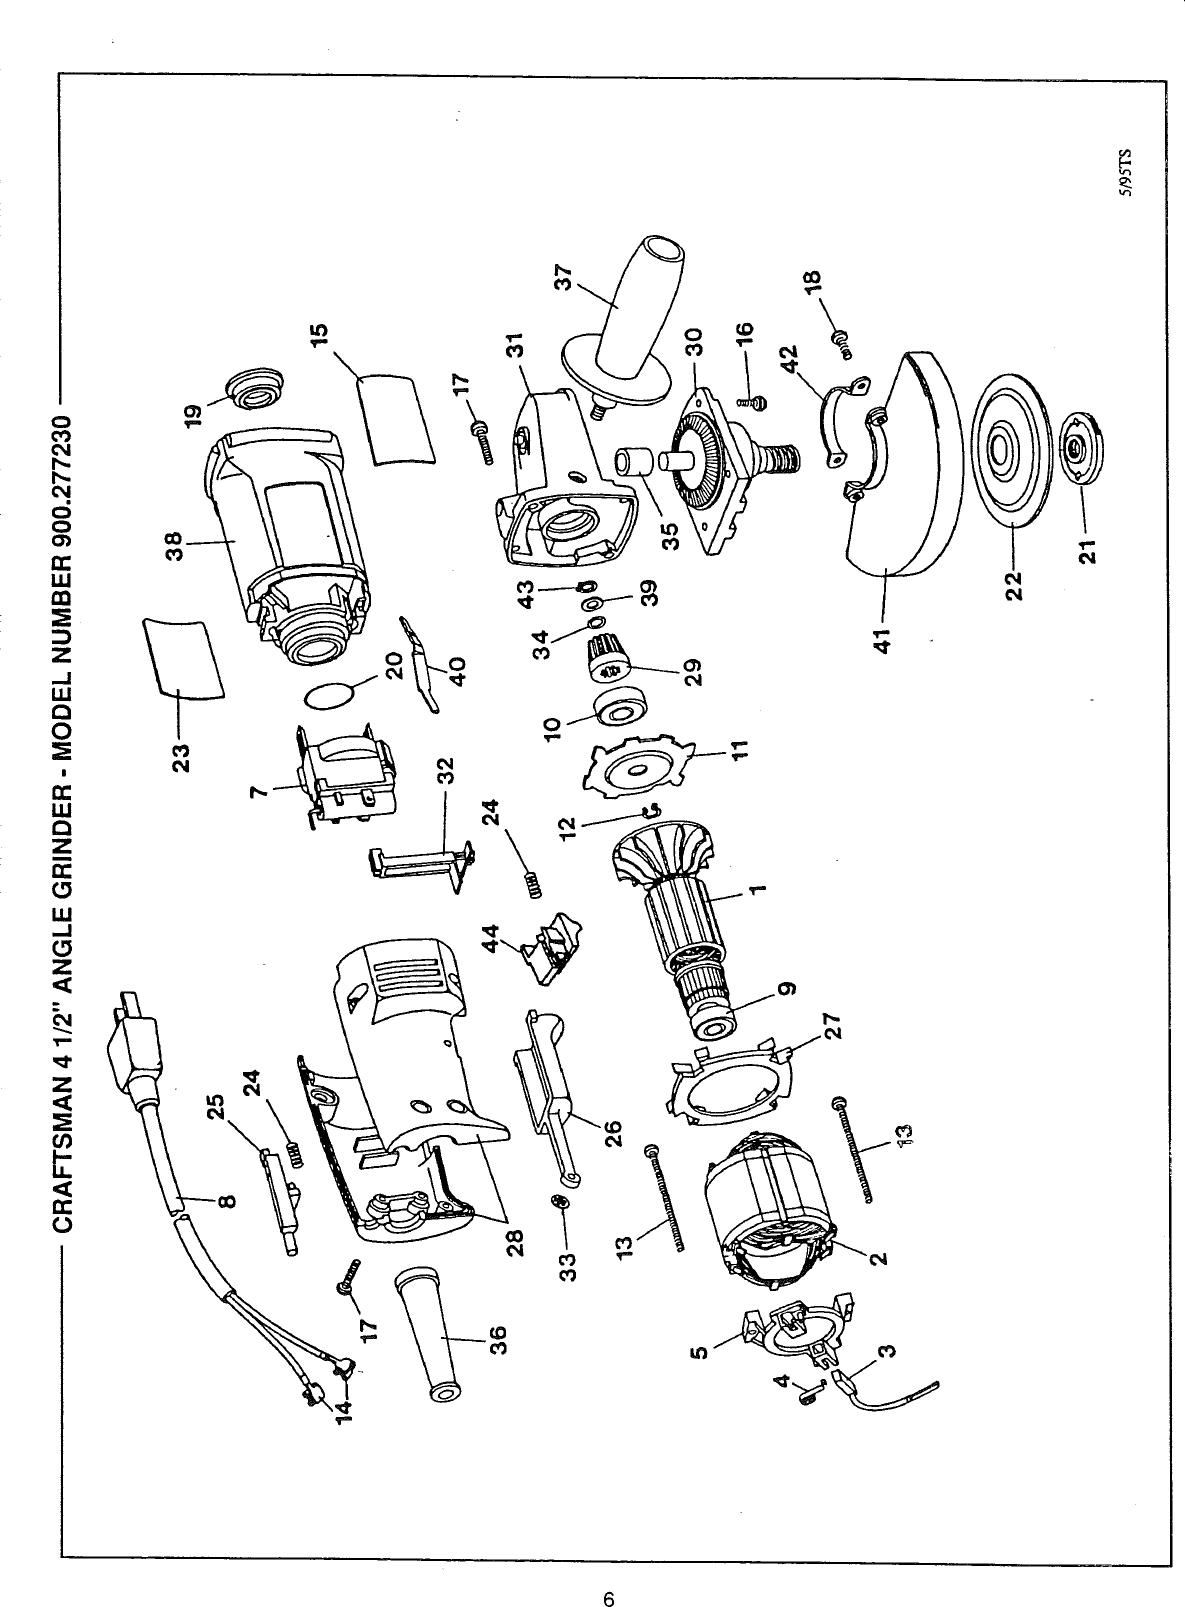 Craftsman 900277230 User Manual ANGLE GRINDER Manuals And